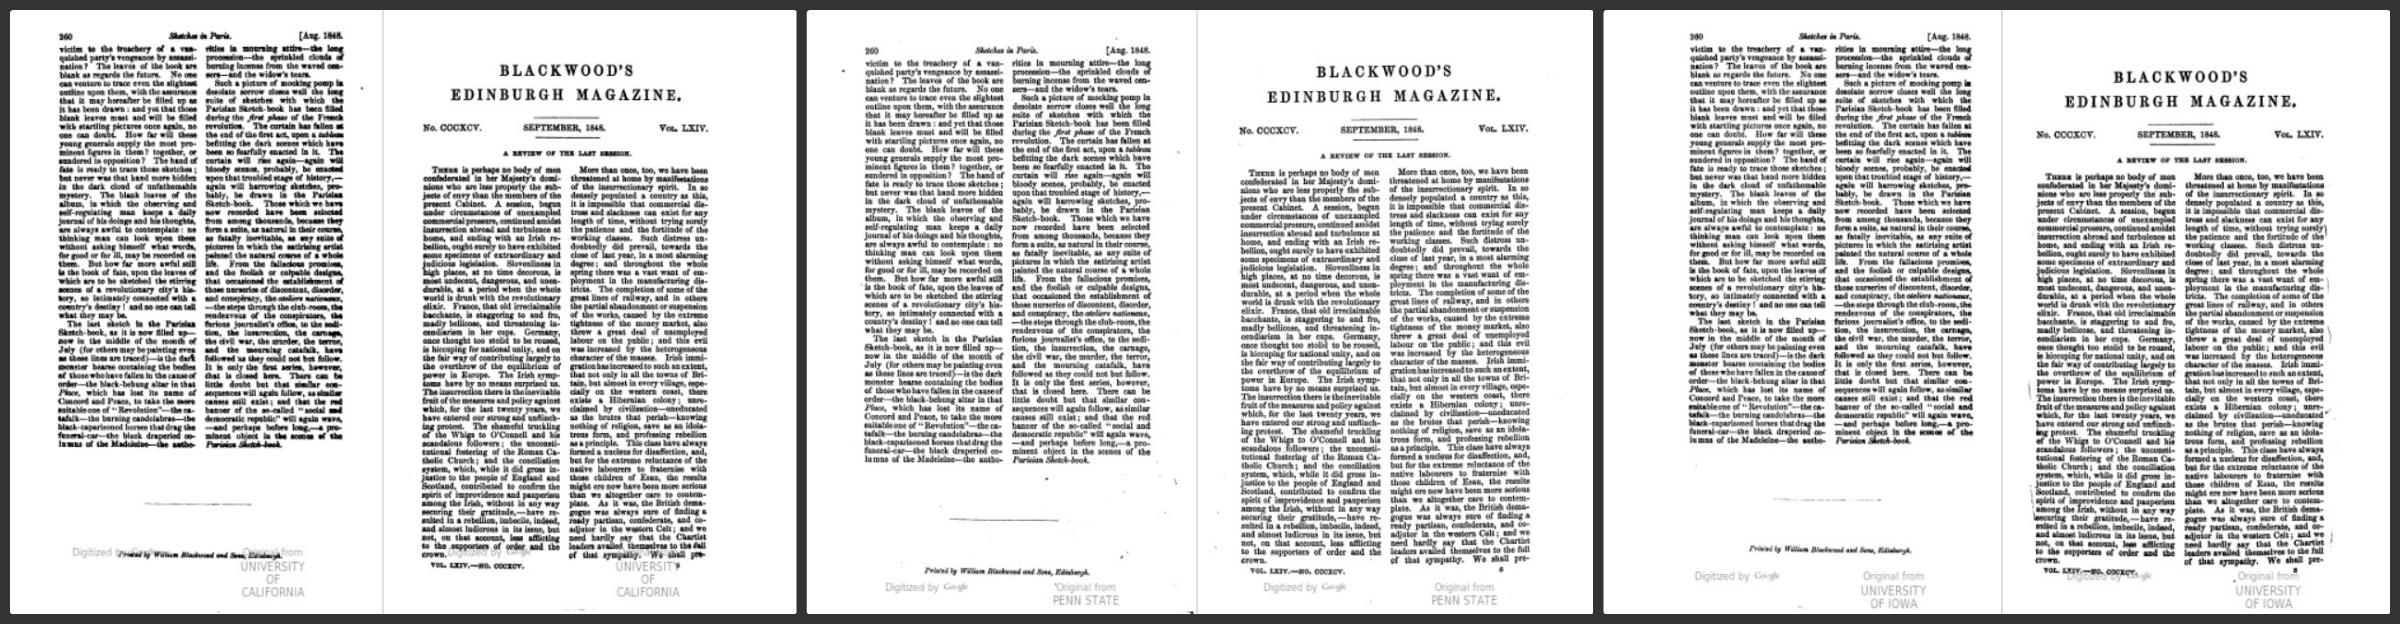 BlackwoodsCollage